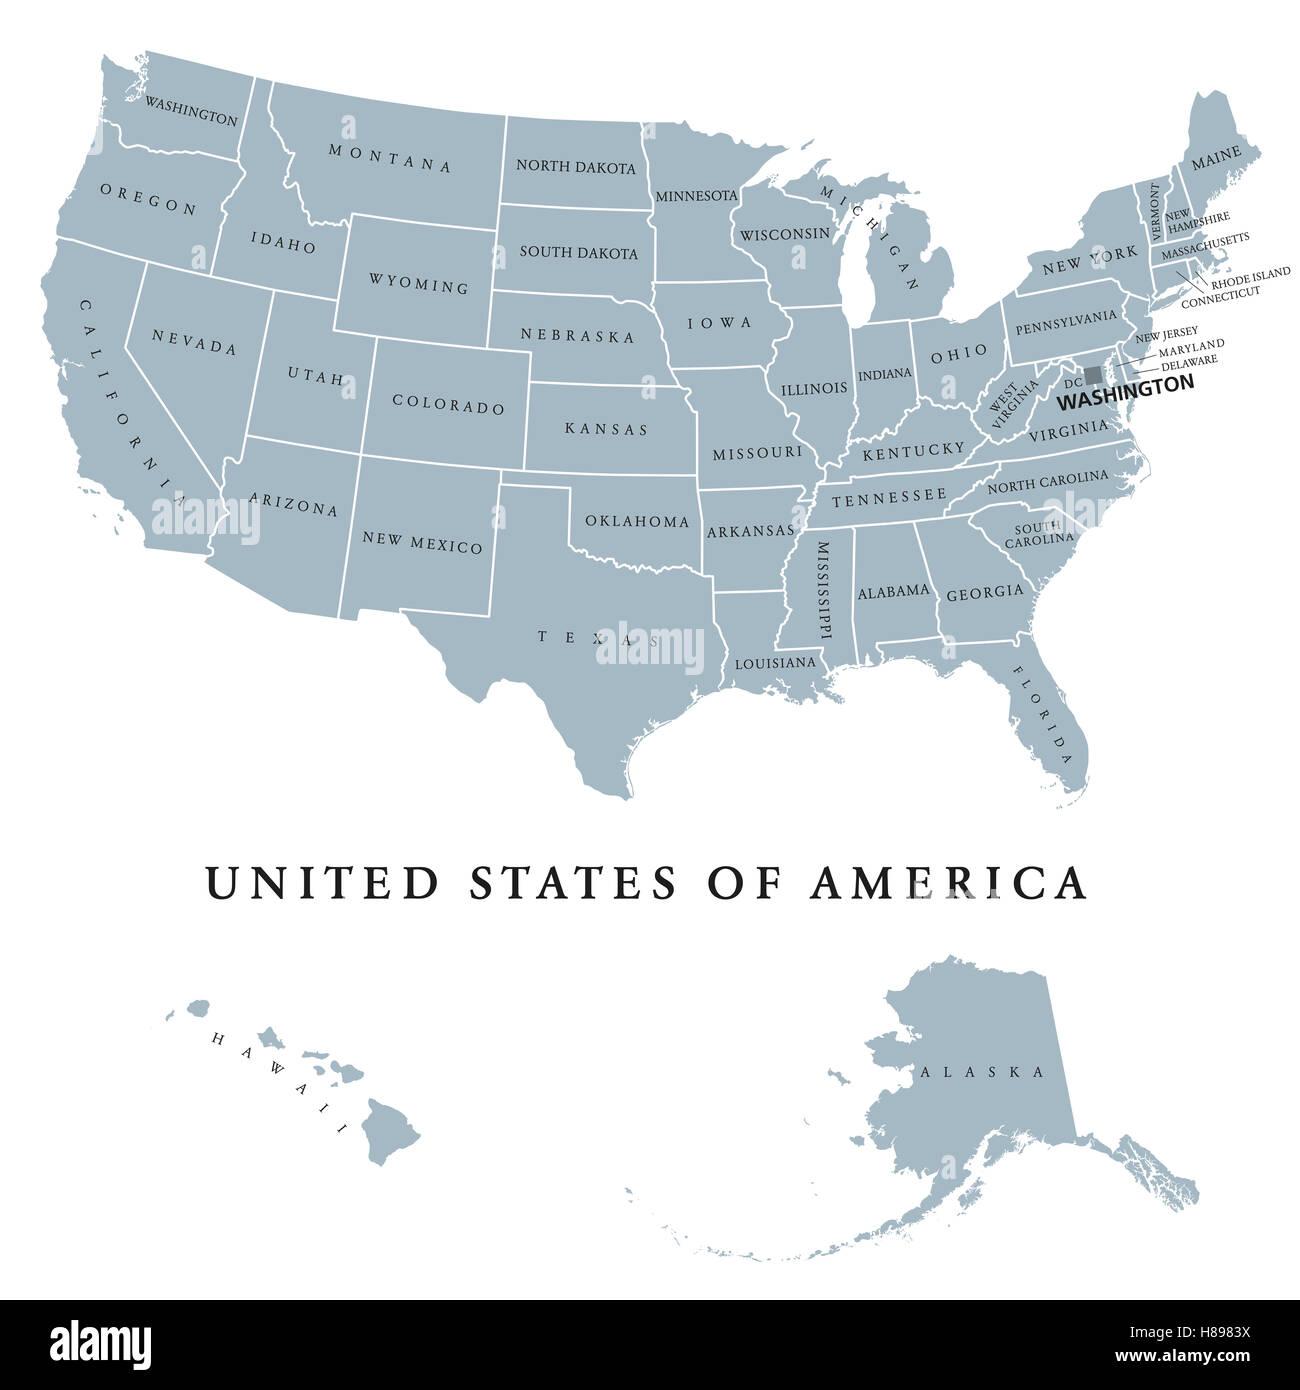 Usa Cartina Politica Con Capitali.Stati Uniti Stati Uniti D America Mappa Politico Con Capitale Washington La Stati Uniti Tra Cui Alaska E Hawaii Foto Stock Alamy